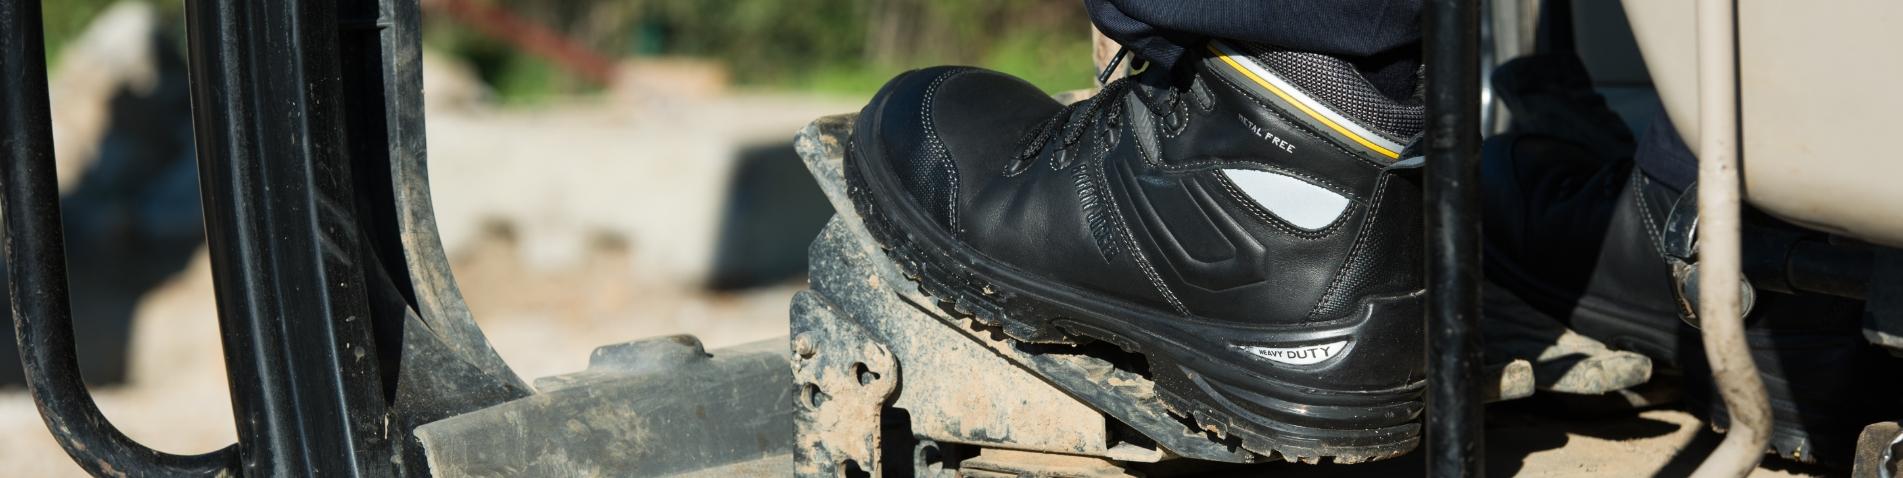 Leuke Dames Werkschoenen.S3 Werkschoenen Kopen